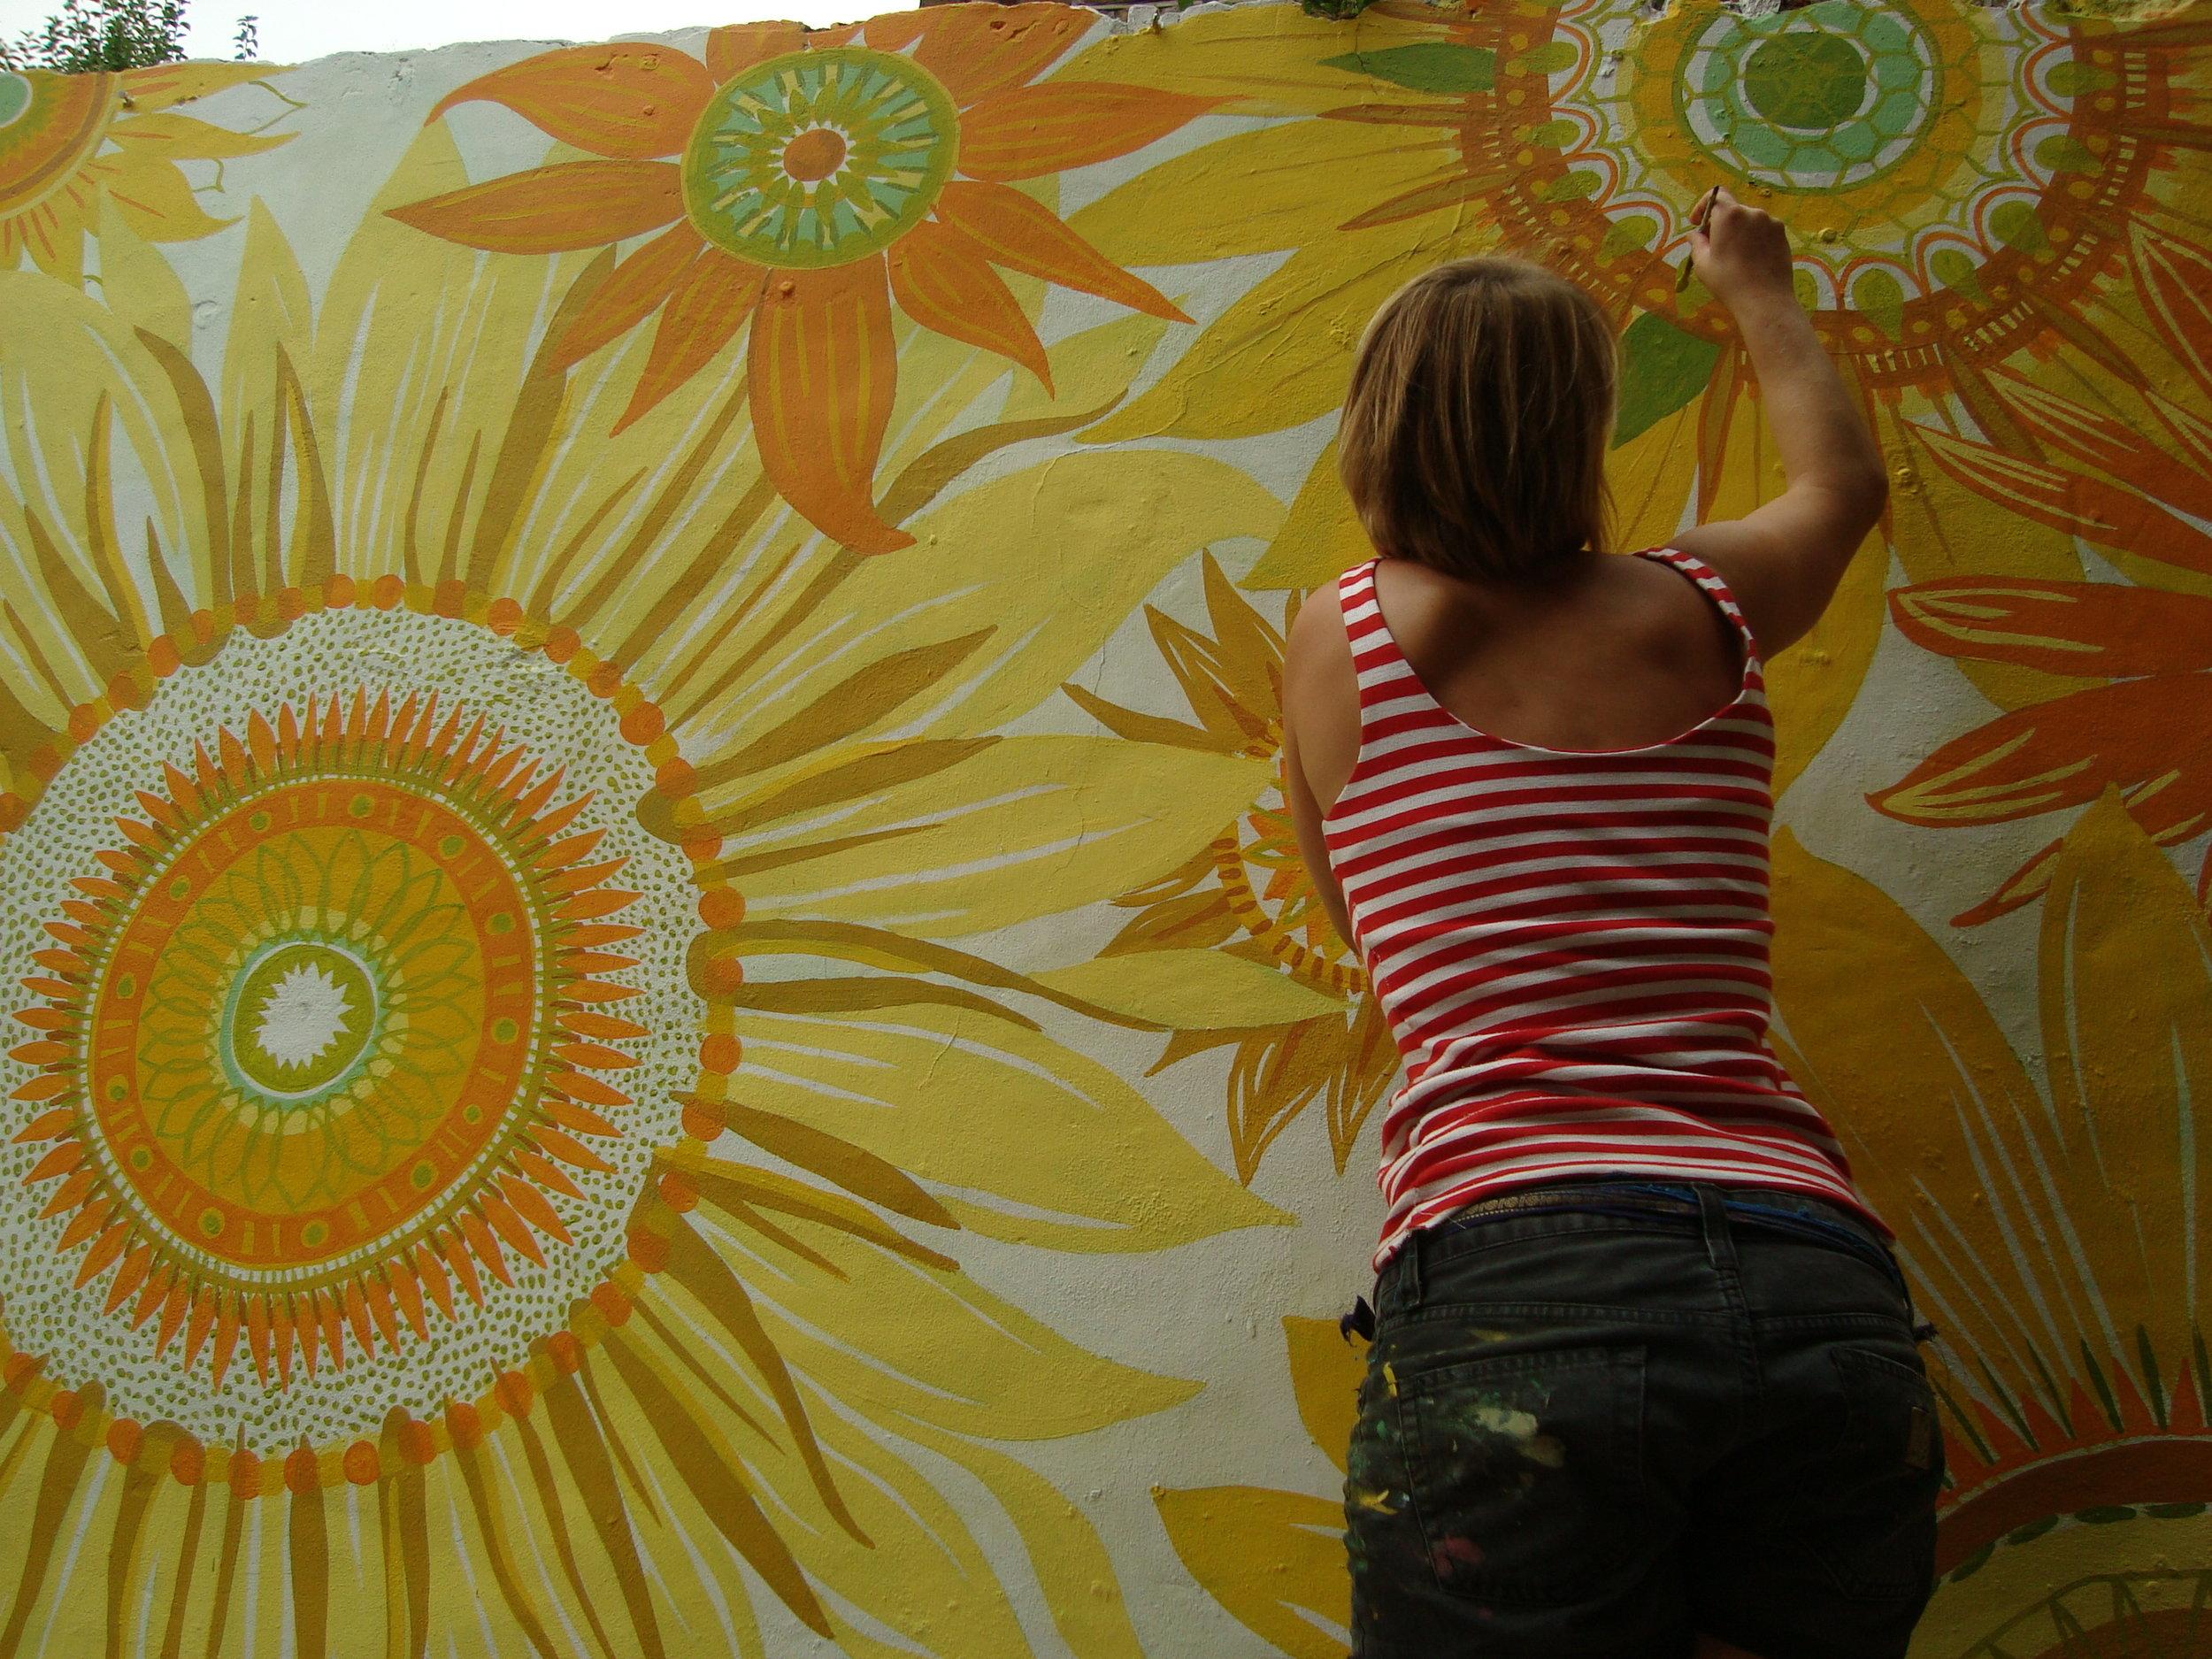 painting sunflowers.JPG